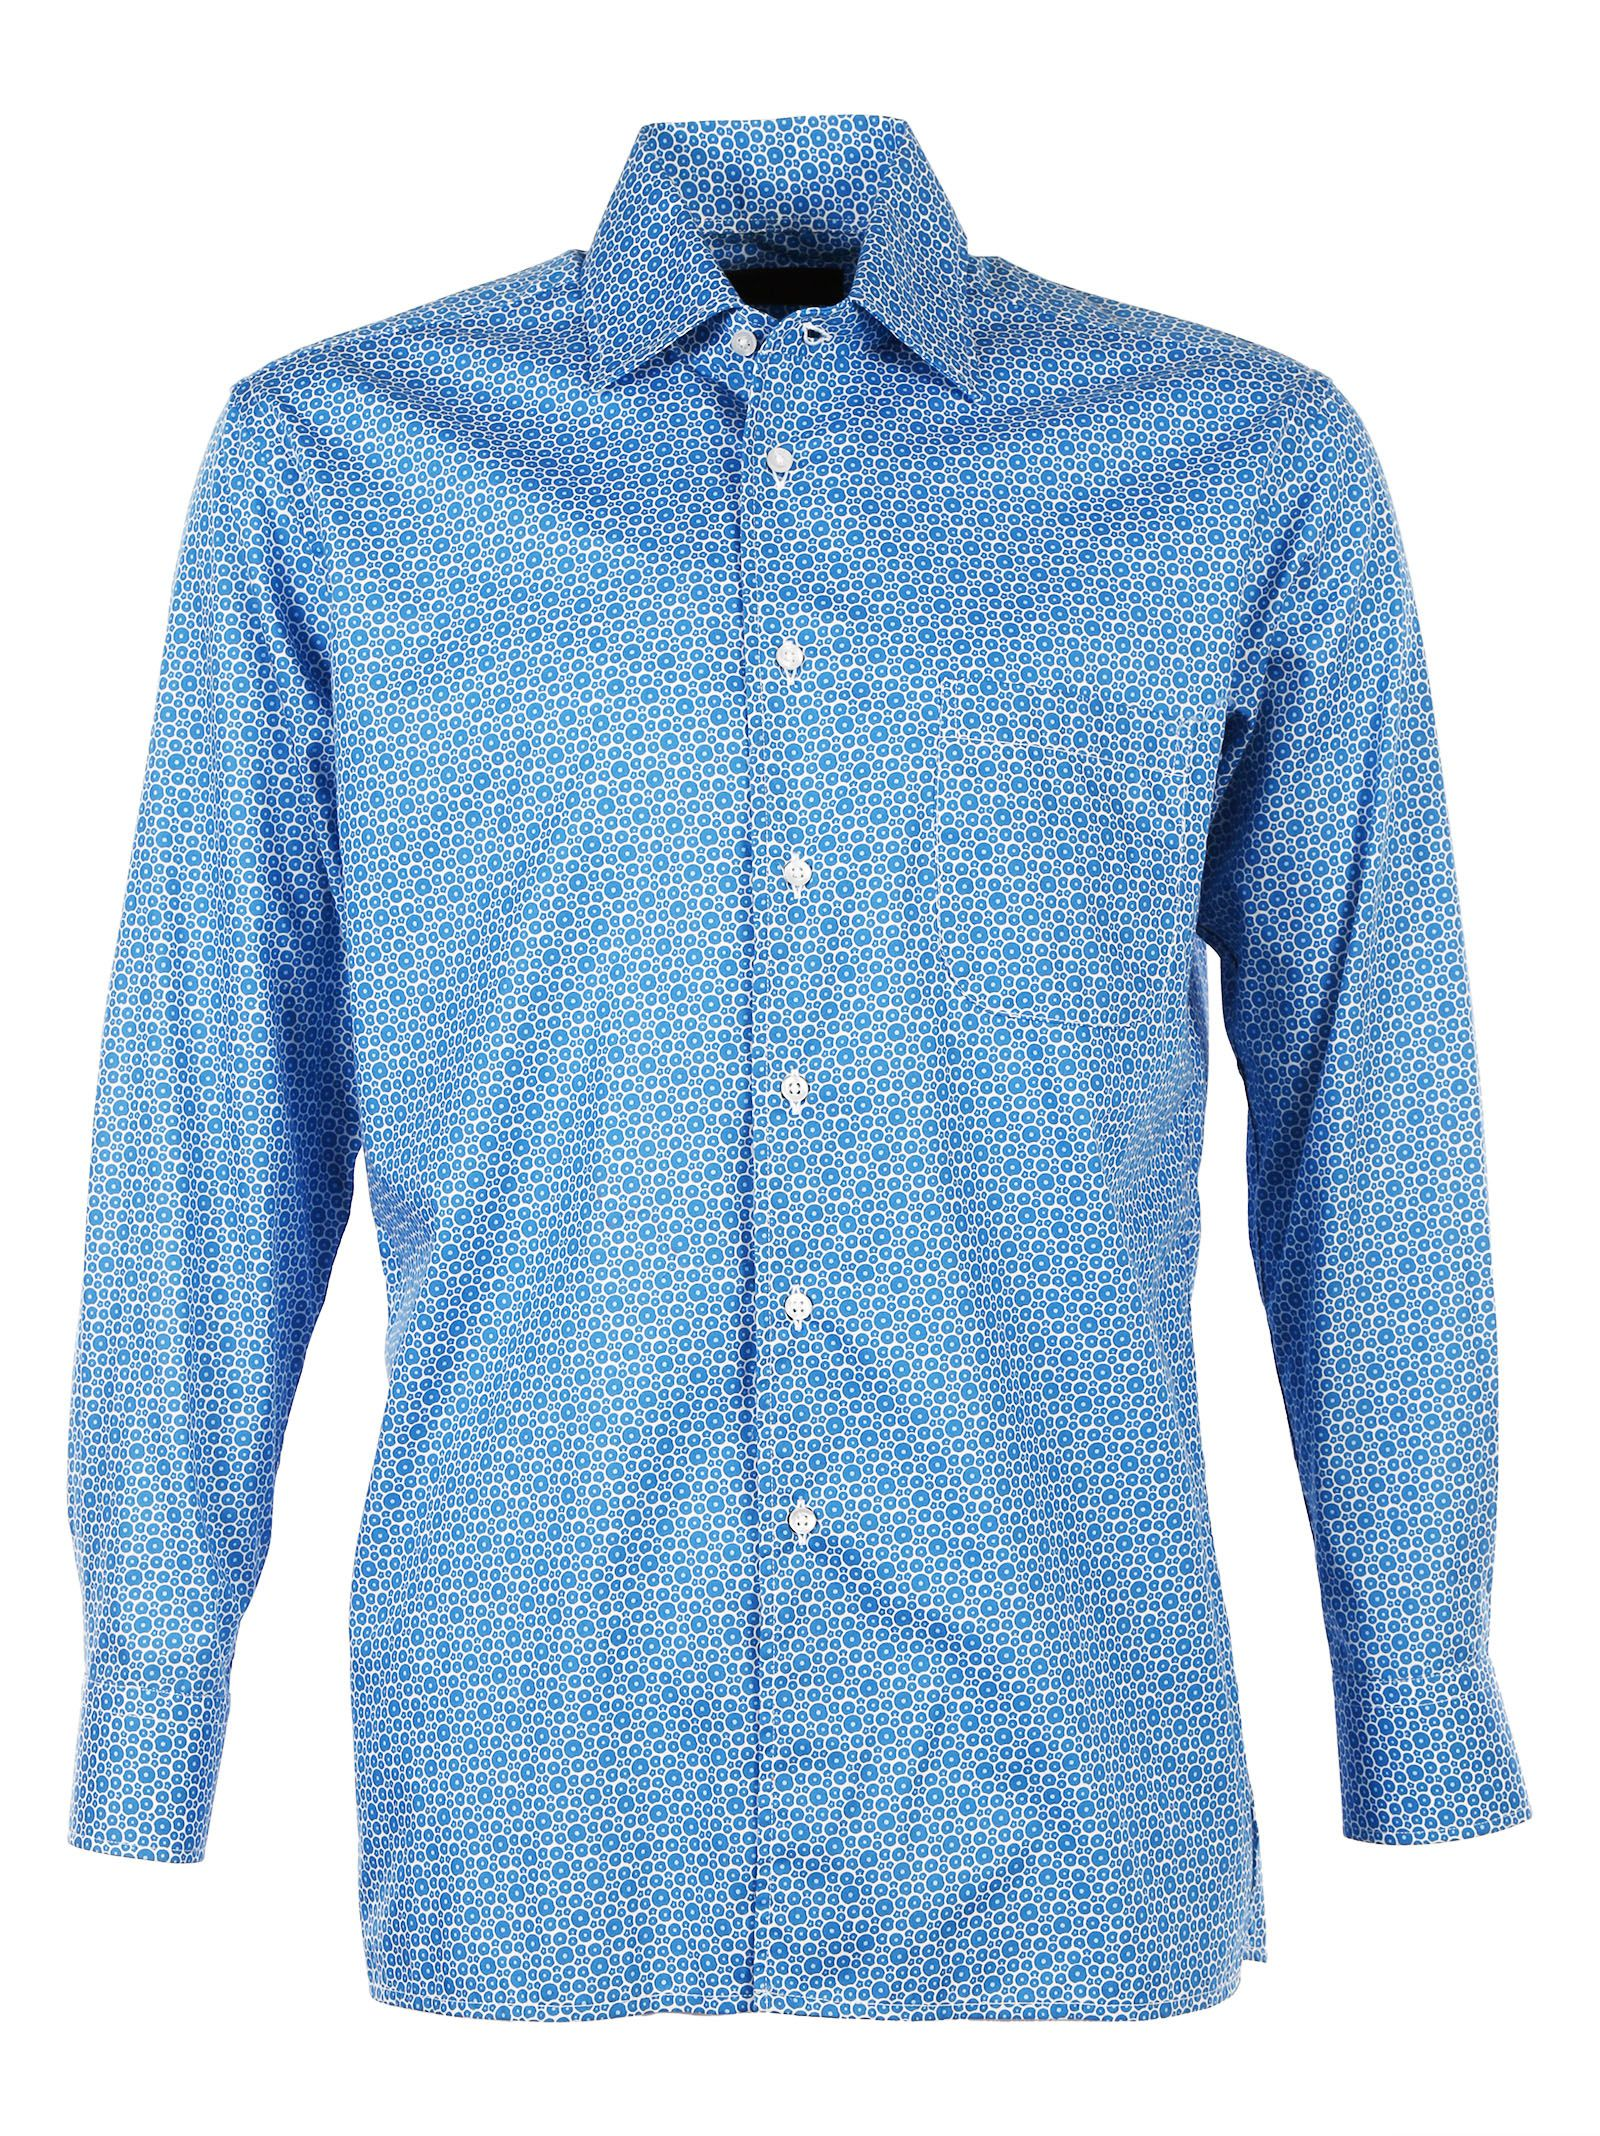 Luchino Camicie Cotton Casacca Shirt